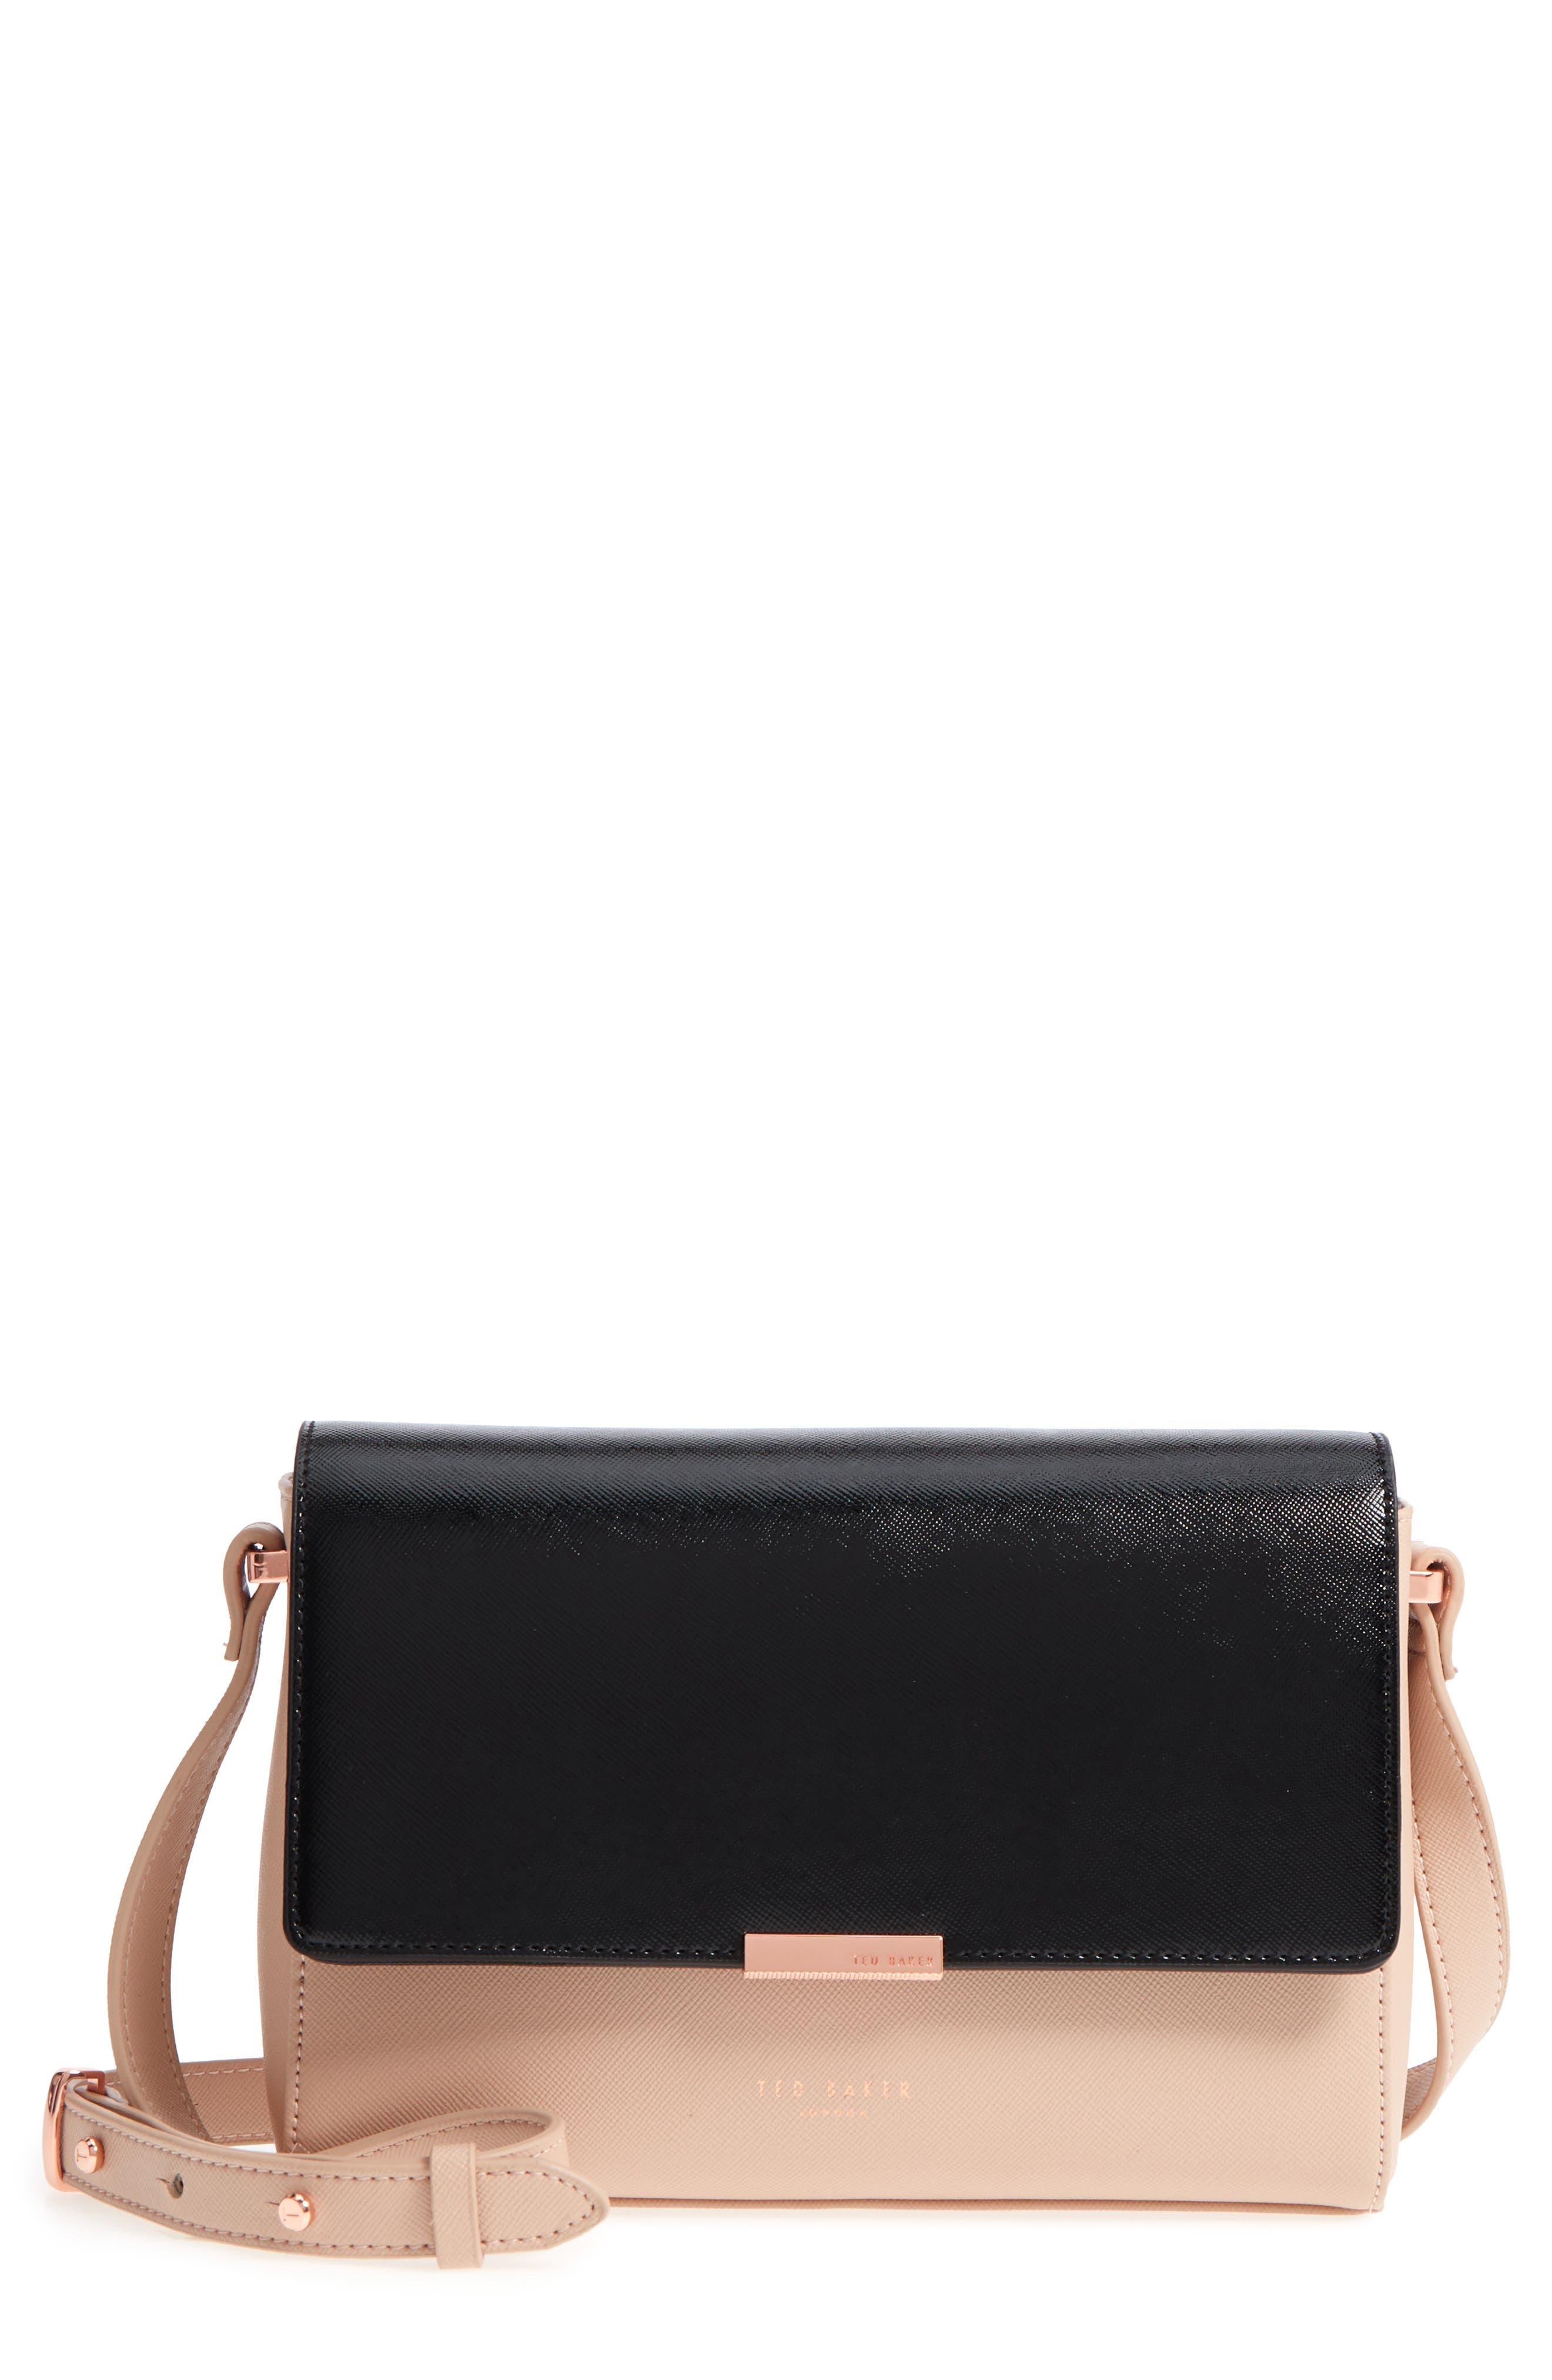 Demonda Faux Leather Crossbody Bag,                             Main thumbnail 1, color,                             Taupe